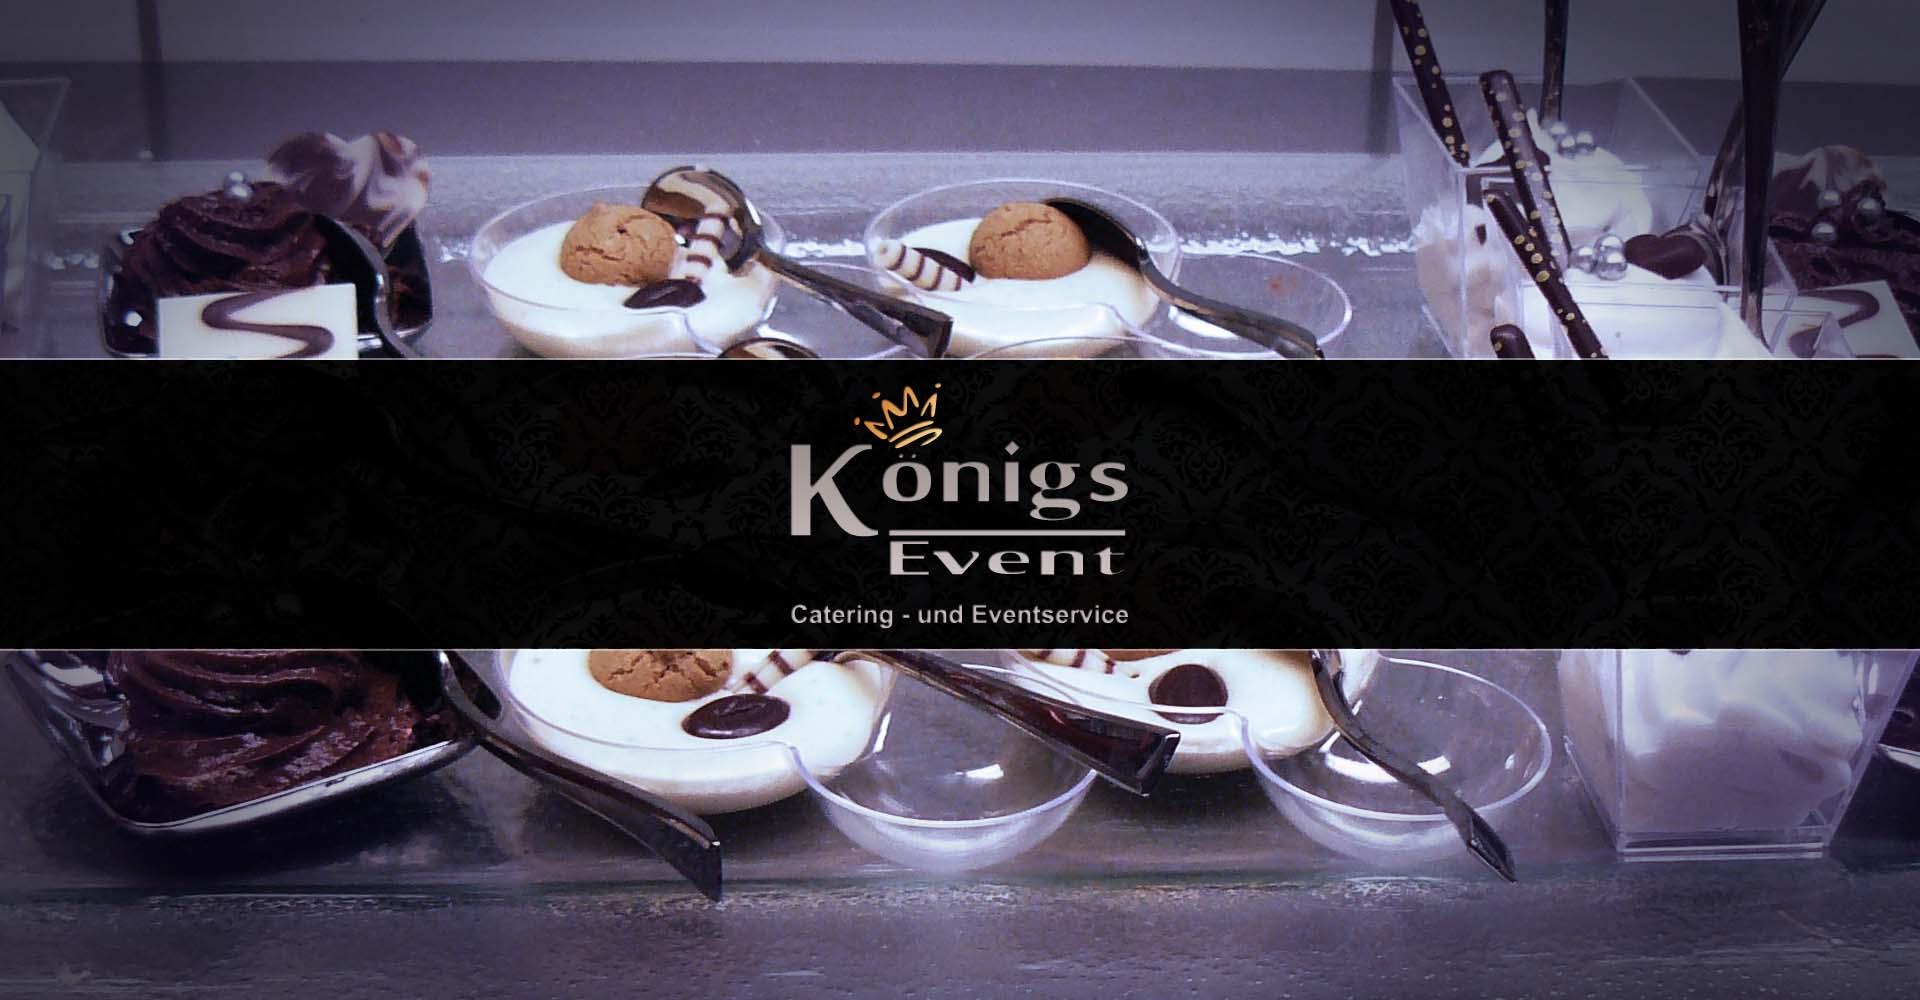 2015-05-26-Startbild-Koenigs-event-074